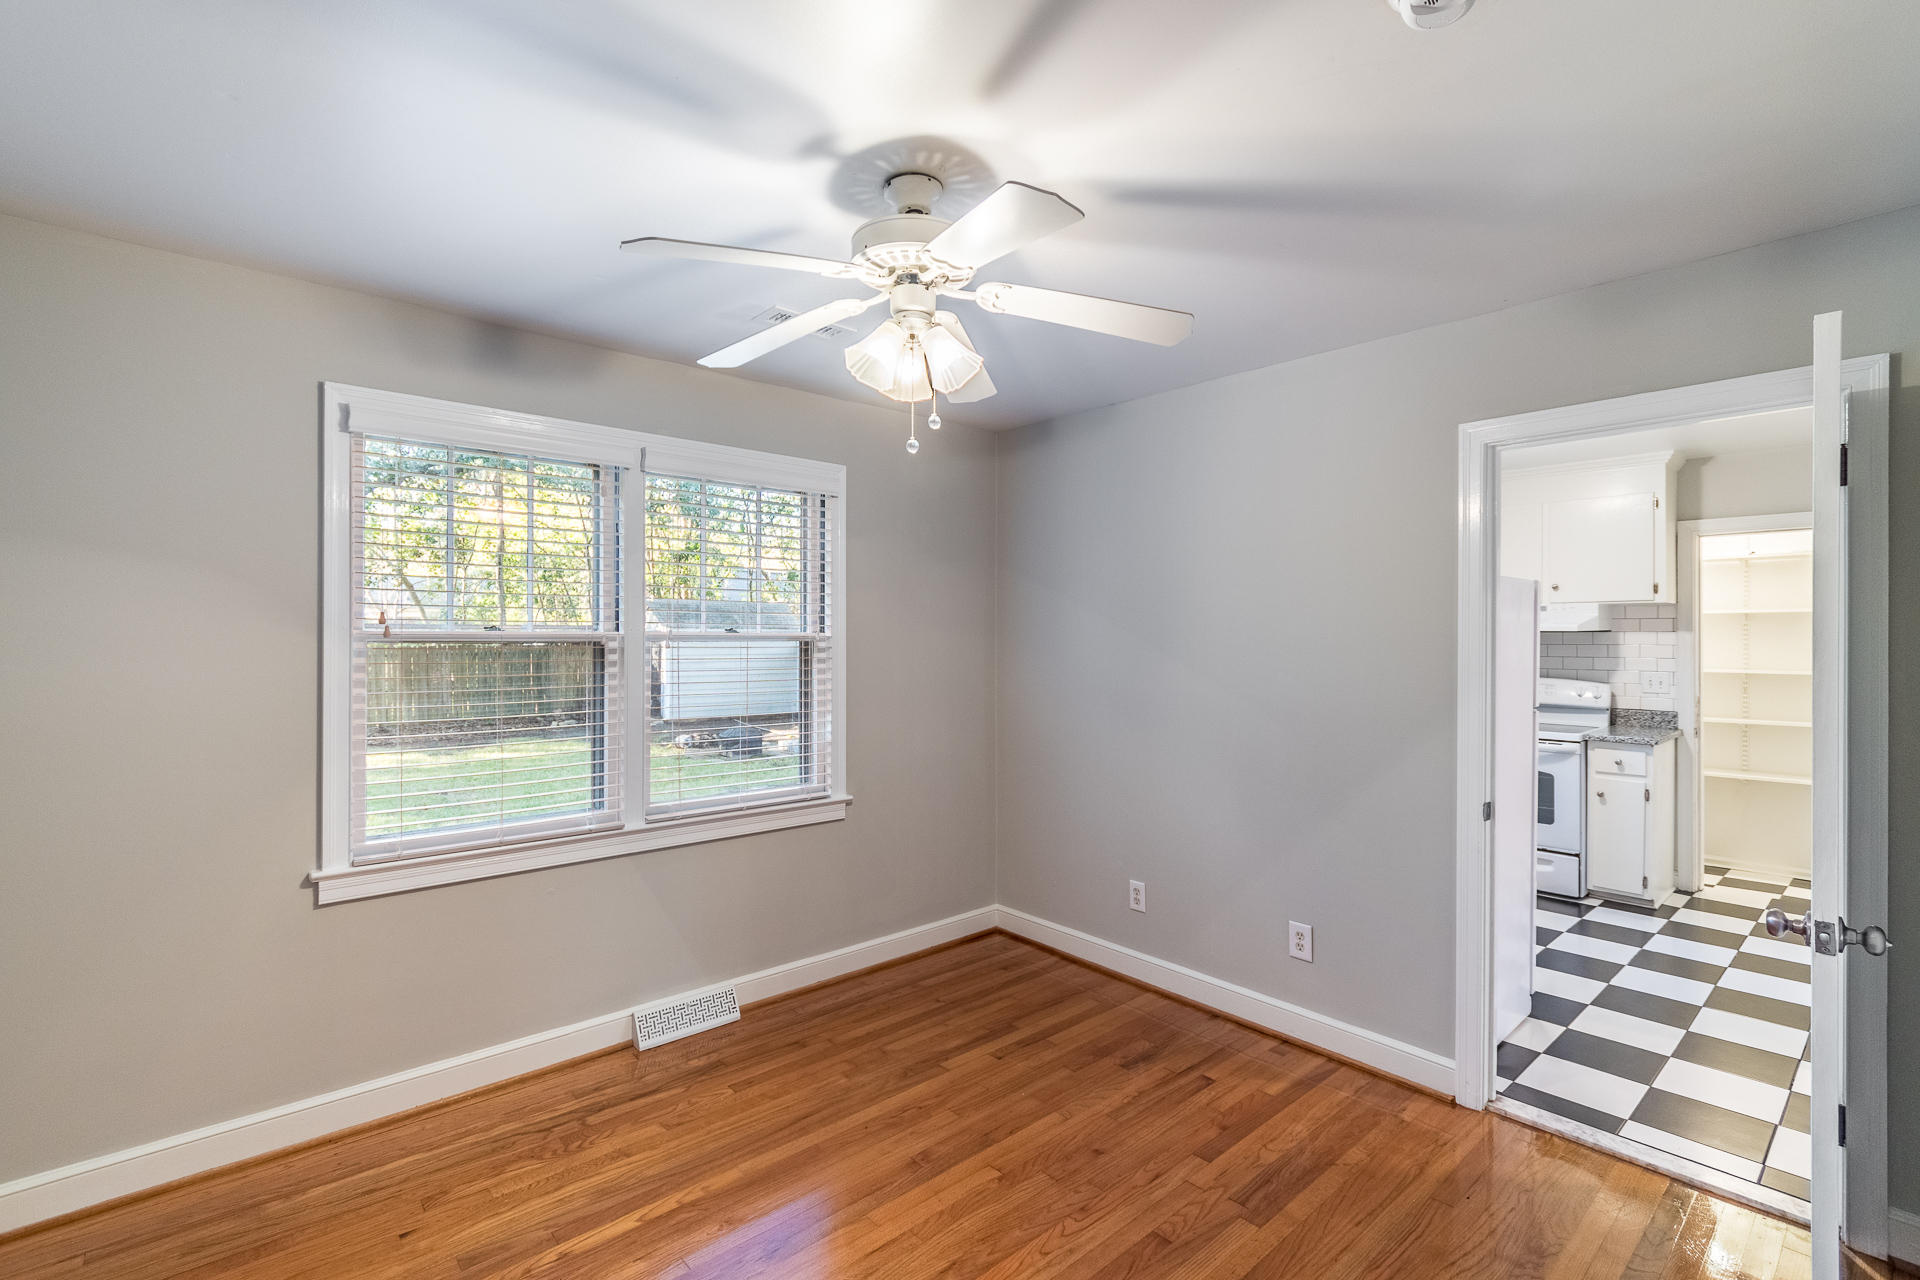 Edgewood Gardens Homes For Sale - 507 Risher, Charleston, SC - 5